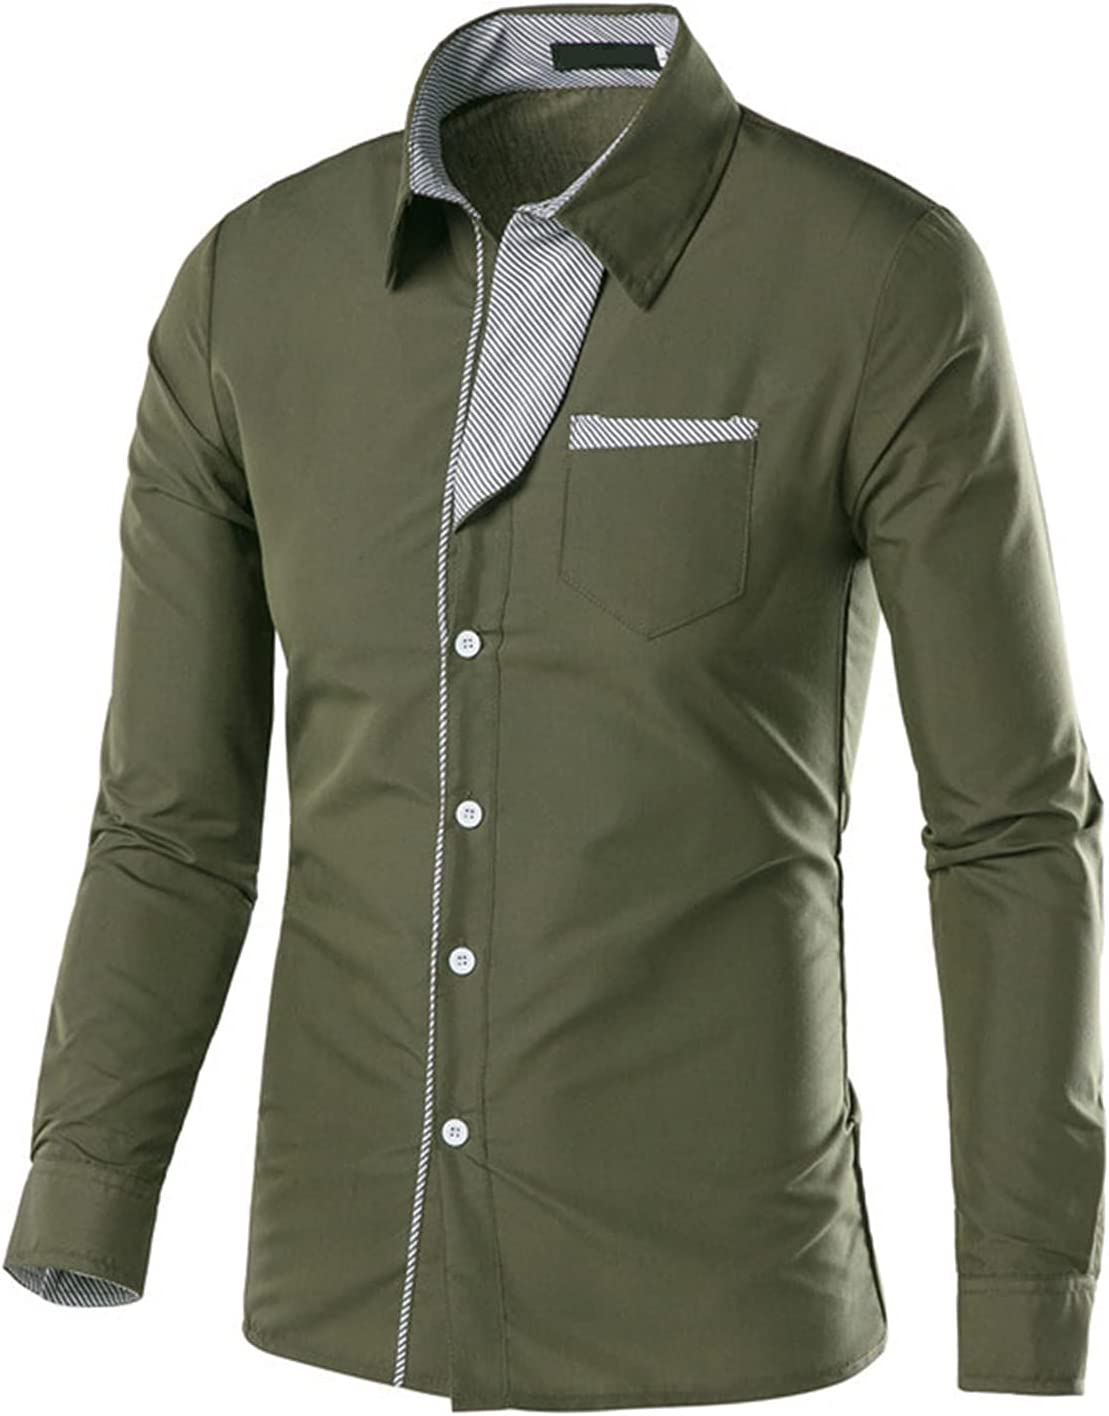 Men's Casual Fashion Business Lapel Dress Shirt Regular Fit Long Sleeve Slim Shirt Button Down Shirts with Pockets (Dark Green,4X-Large)